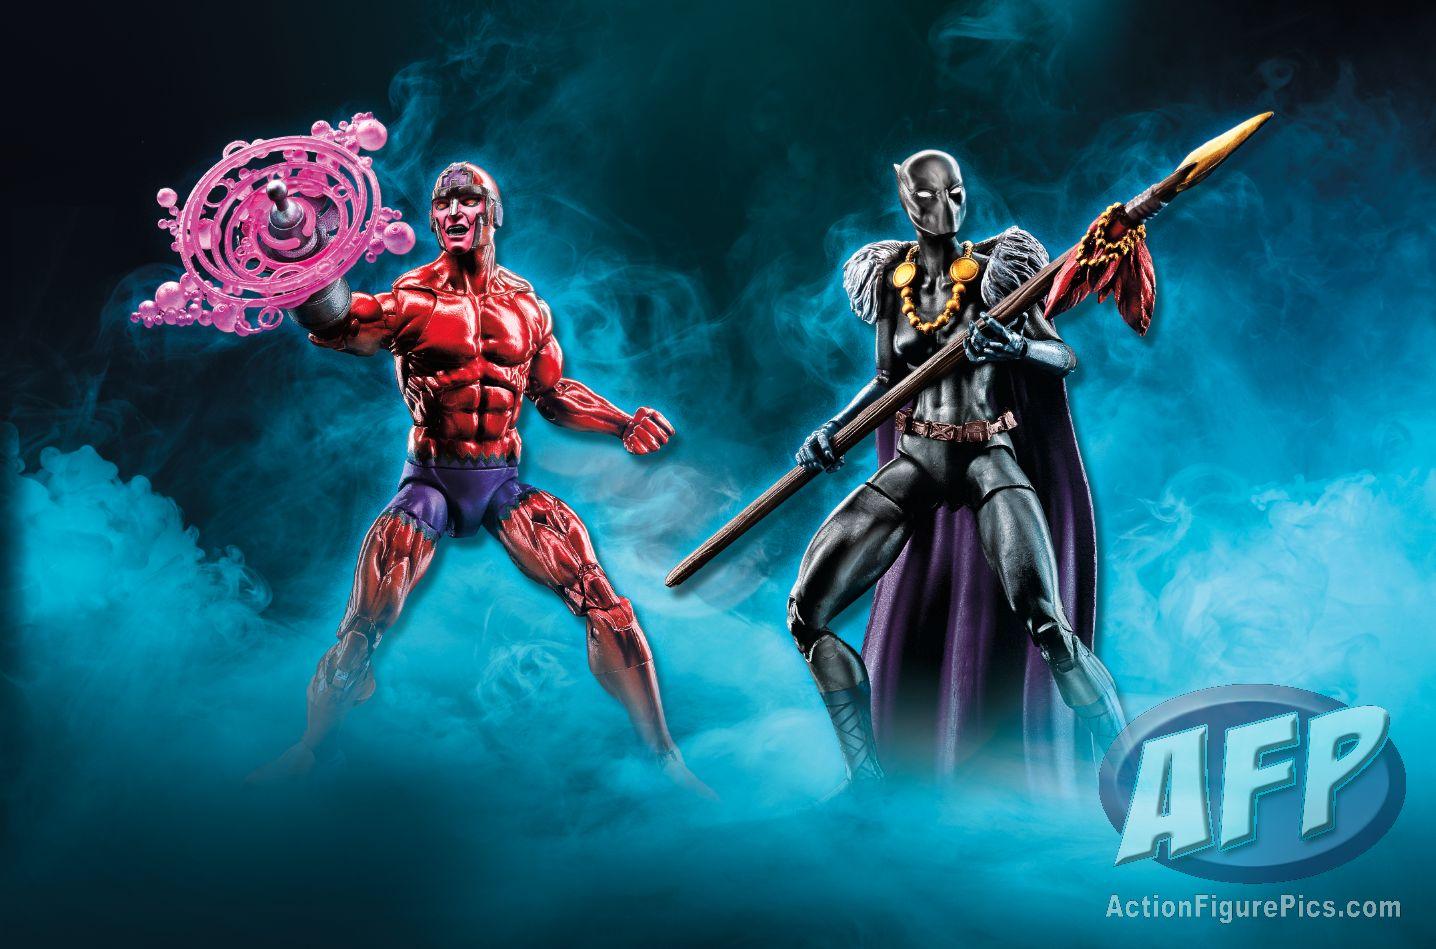 Nycc 2017 Hasbro Marvel Legends Report Updated